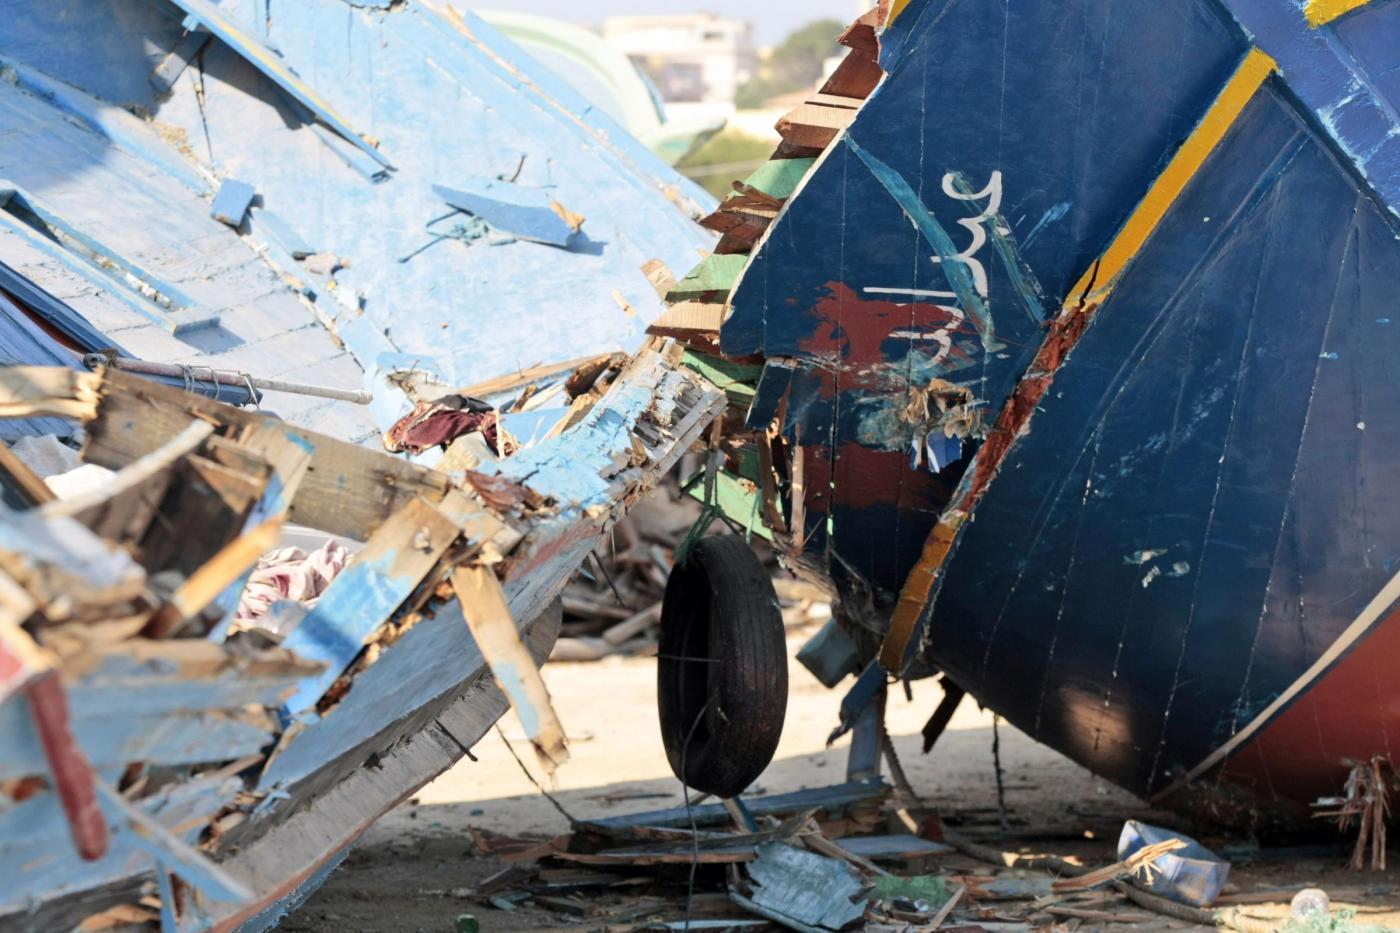 Lampedusa, la terra promessa